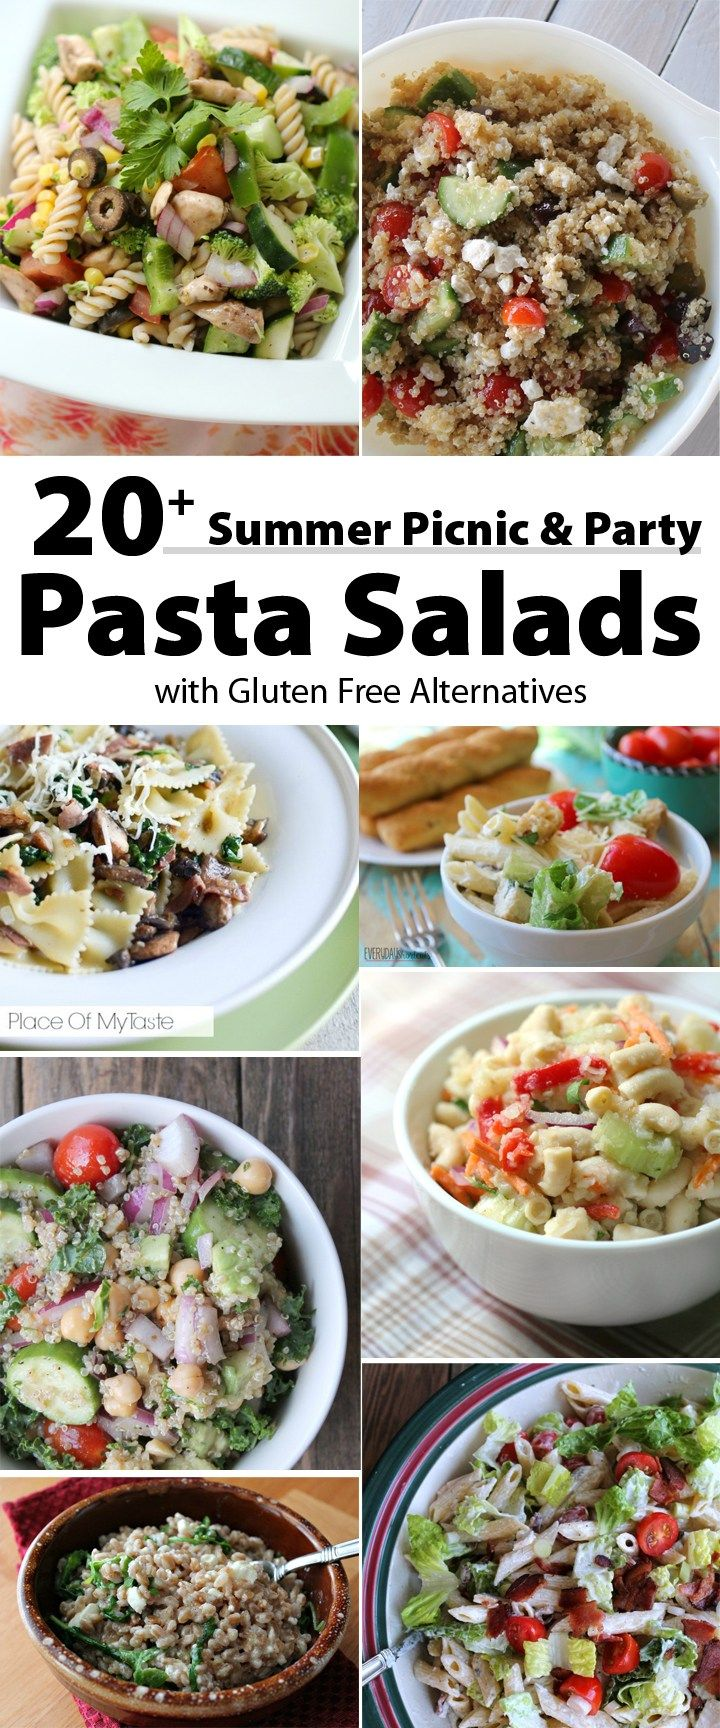 20 + Summer Picnic Pasta Recipes with Gluten Free Alternatives.